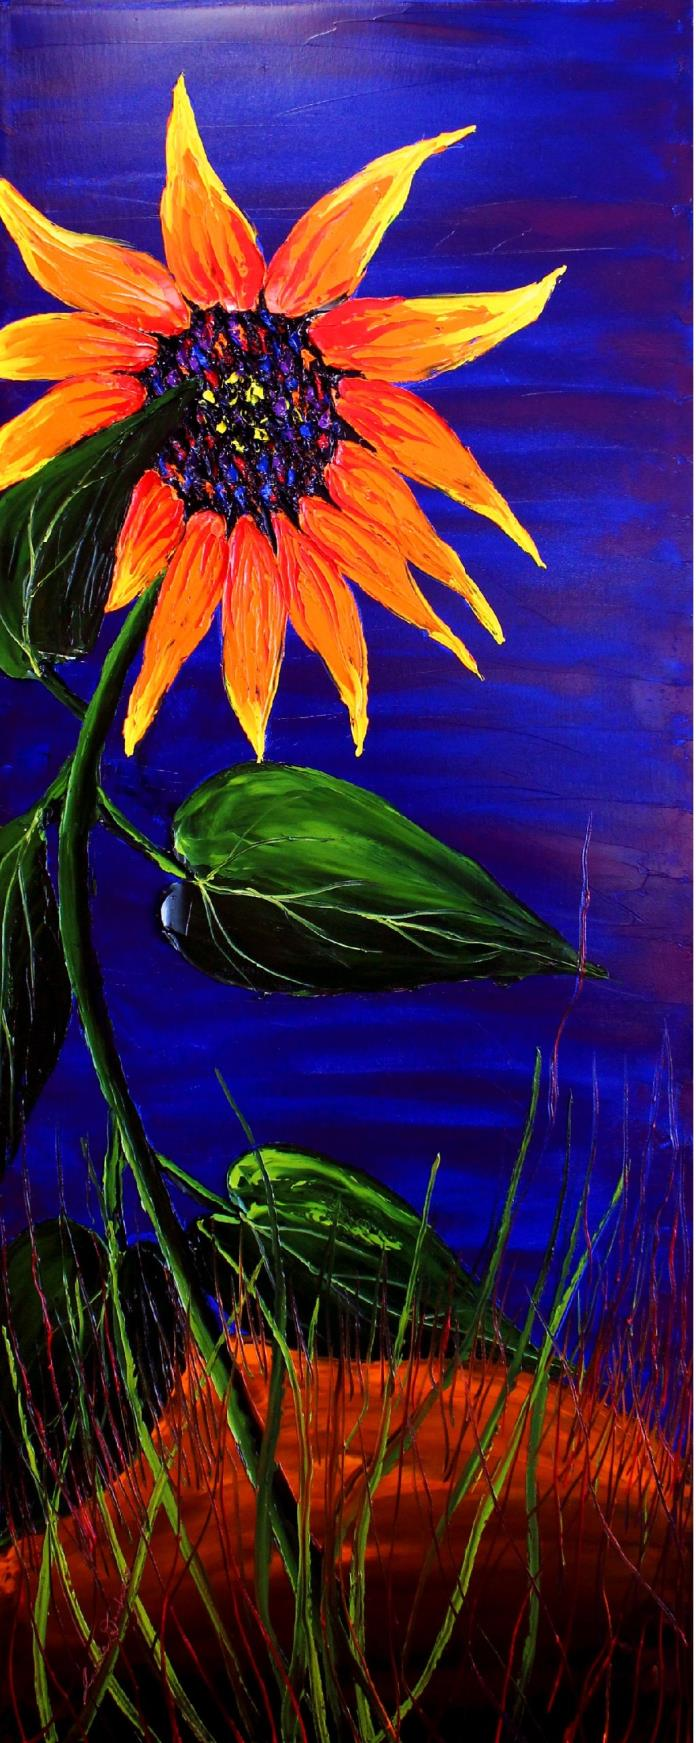 Mid-Night Orange Sunflower #5